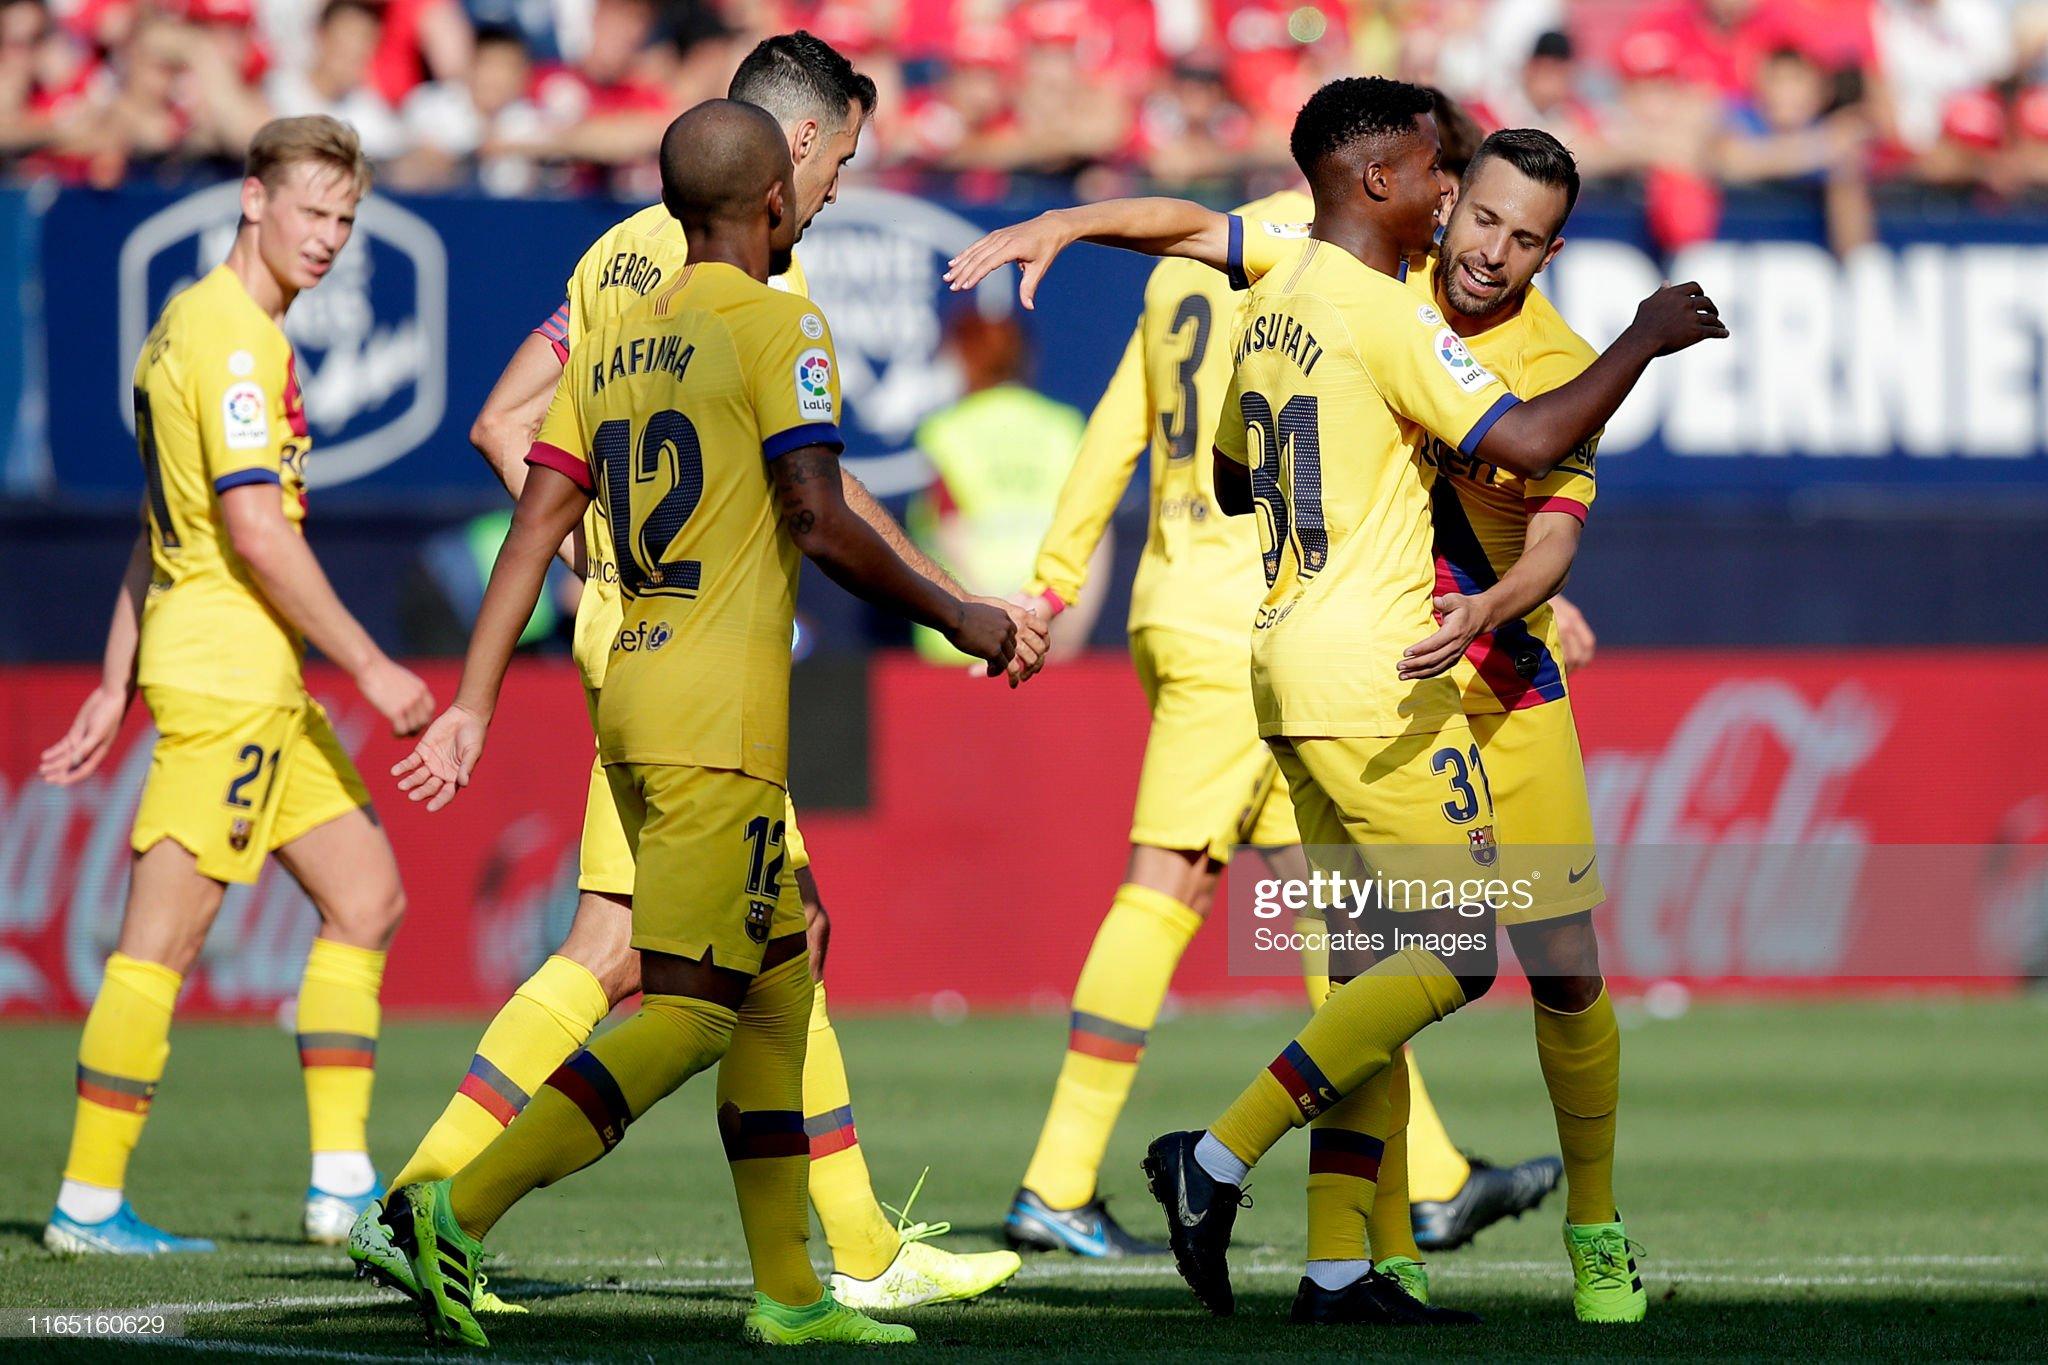 صور مباراة : أوساسونا - برشلونة 2-2 ( 31-08-2019 )  Ansu-fati-of-fc-barcelona-celebrates-with-jordi-alba-of-fc-barcelona-picture-id1165160629?s=2048x2048